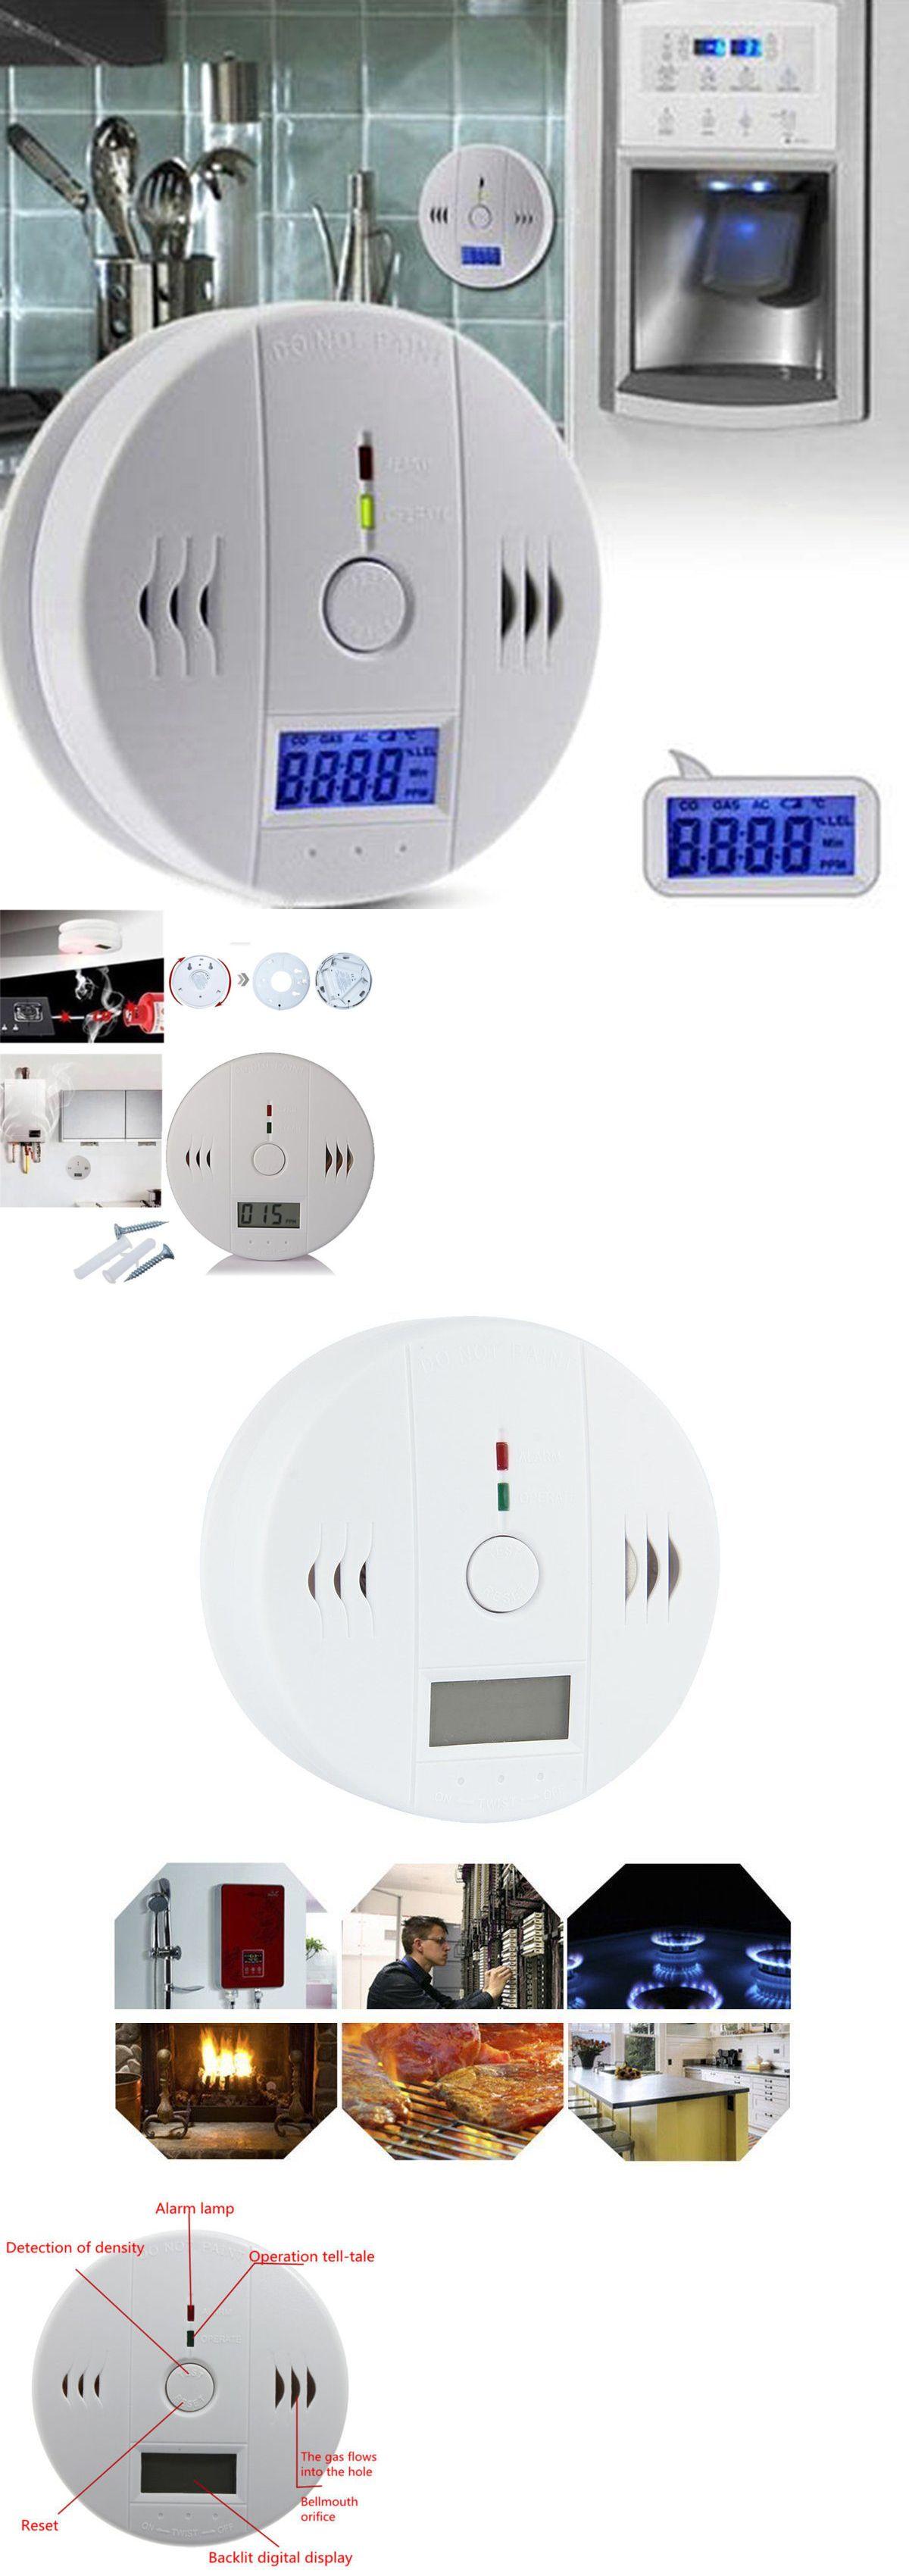 Carbon Monoxide Detectors 115943 Lcd Co Carbon Monoxide Tester Poisoning Gas Sensor Warning Alarm Detector Buy It Now Only With Images Detector Carbon Monoxide Carbon